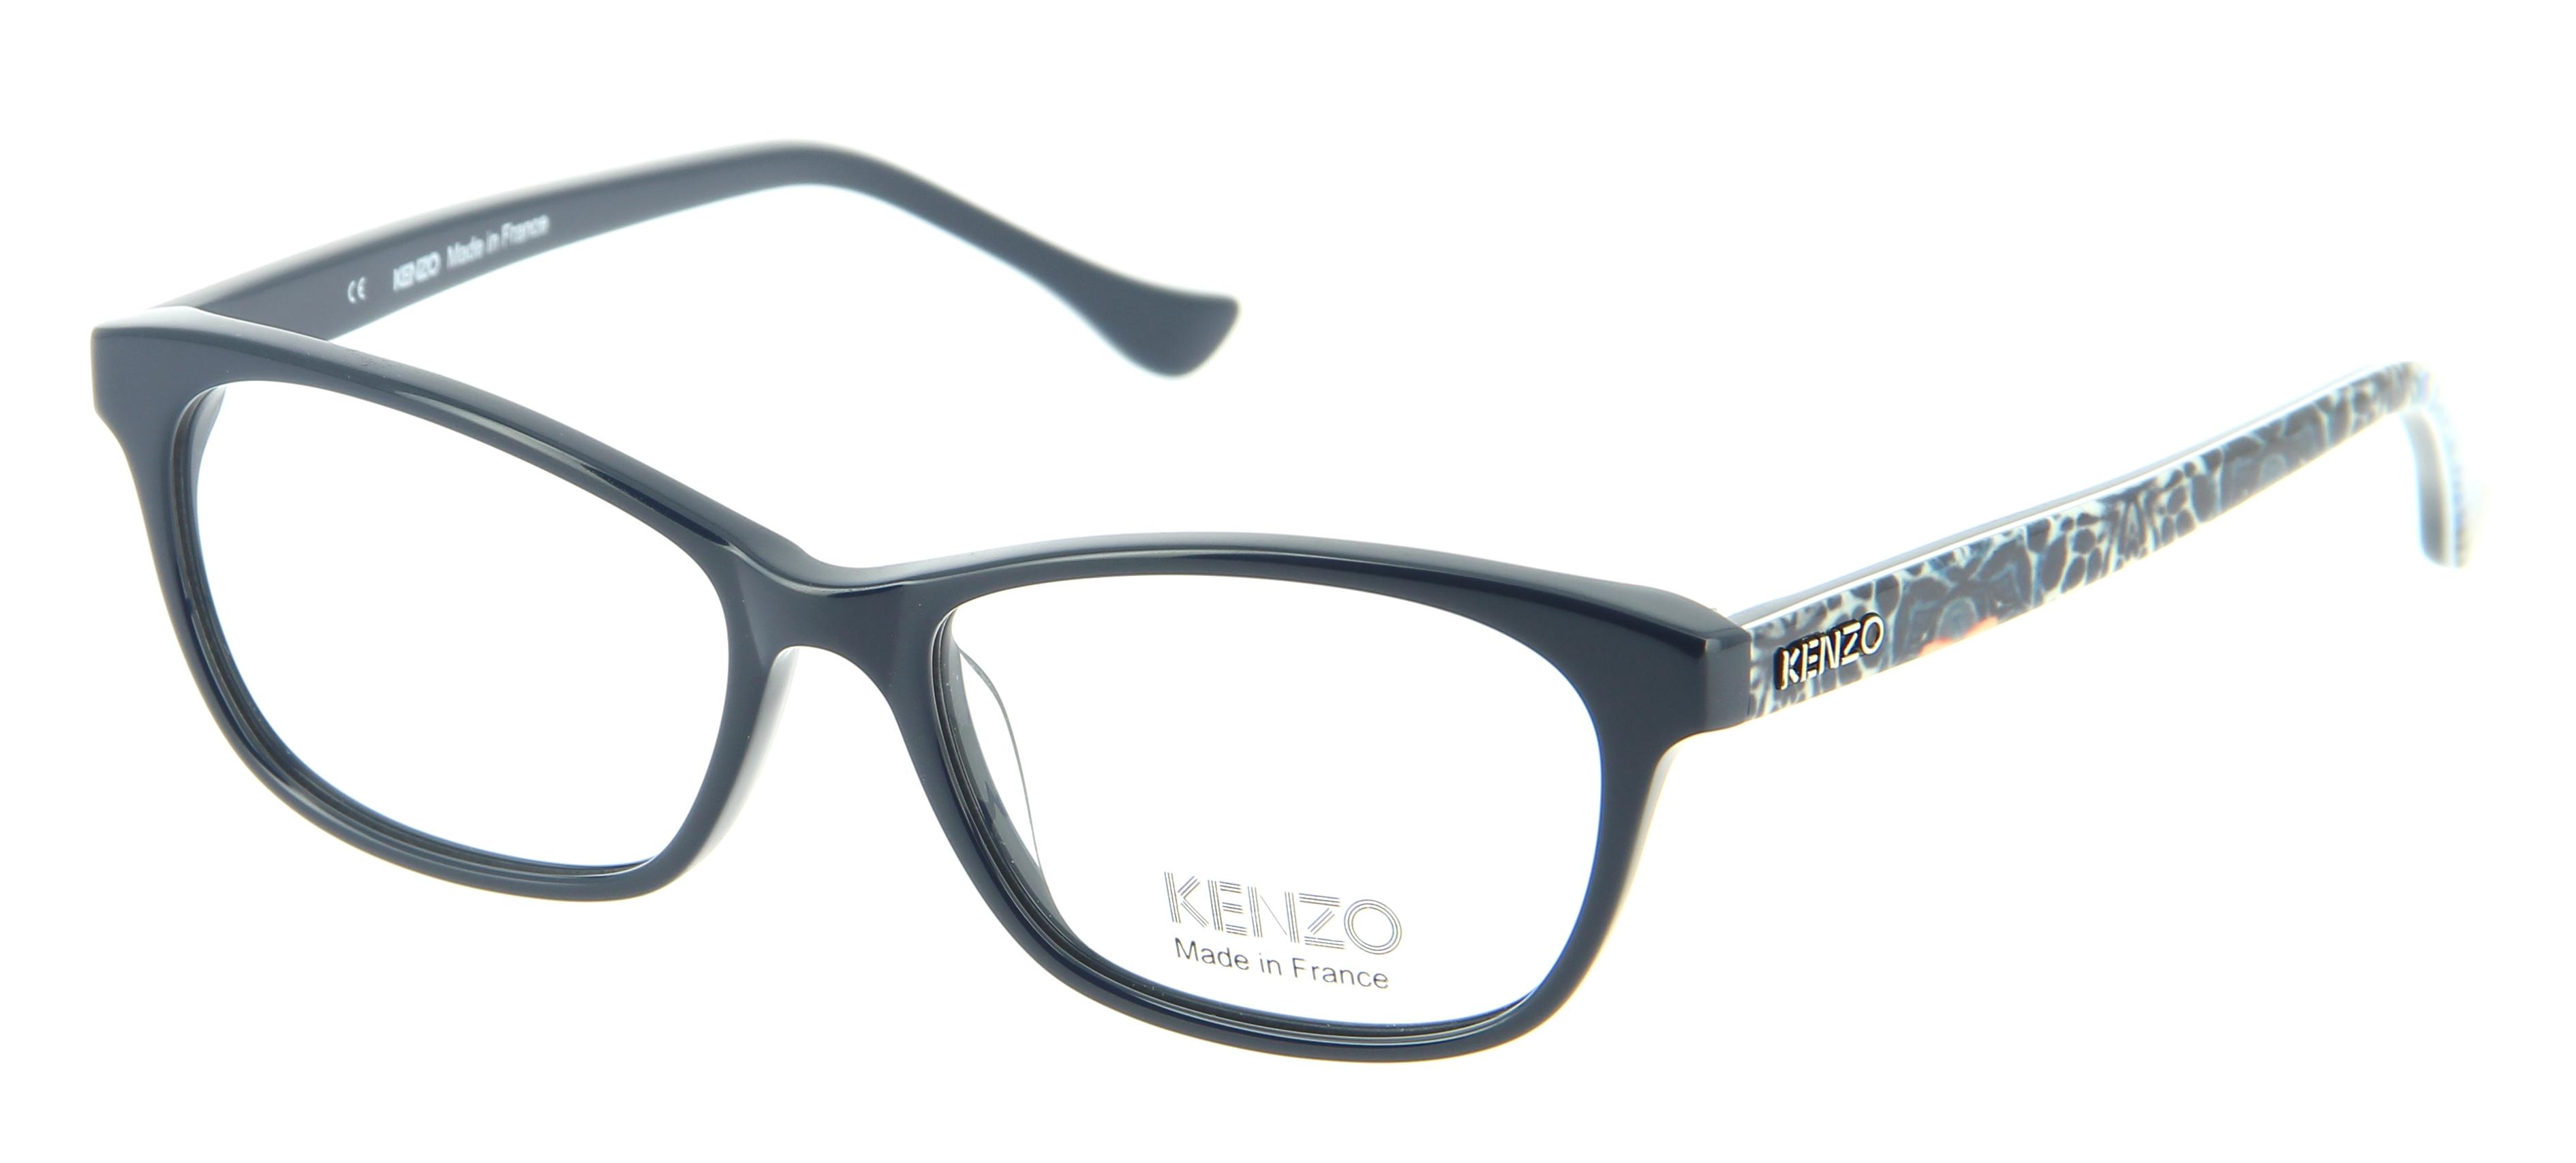 Kenzo Glasses Frames : Eyeglasses KENZO KZ 2208 C02 52/15 Woman bleu square ...